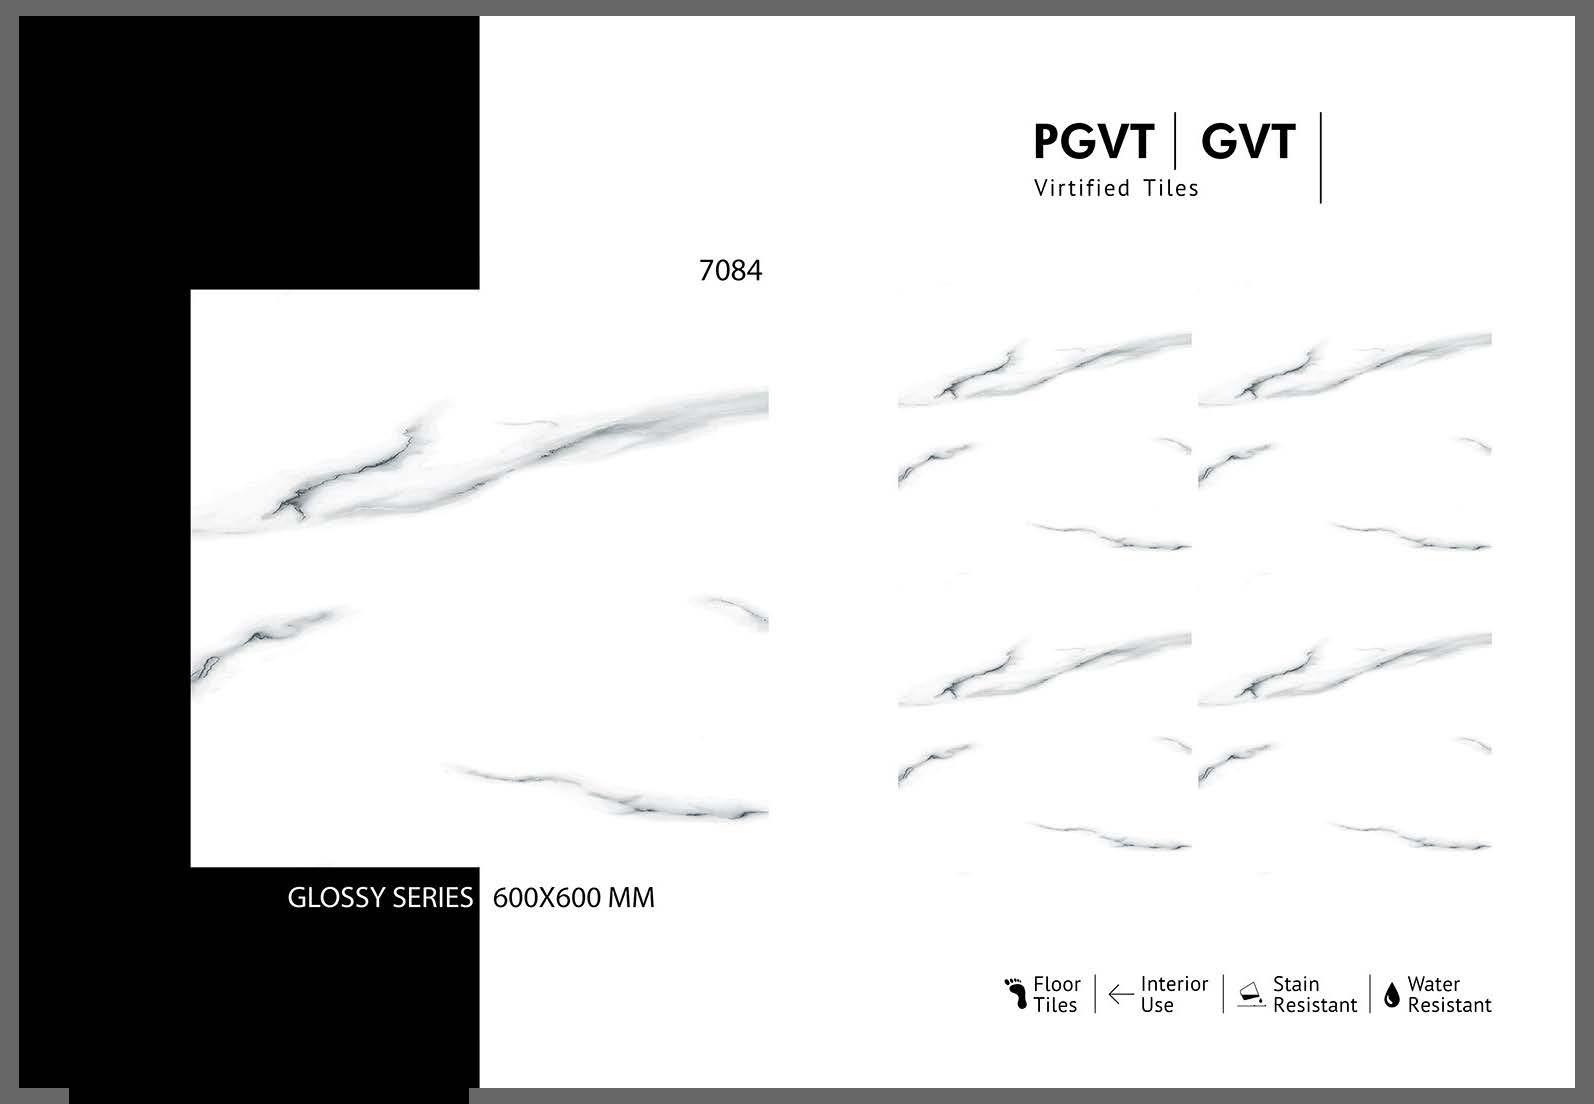 GVT 2X2 GLOSSY_Page_71.jpg